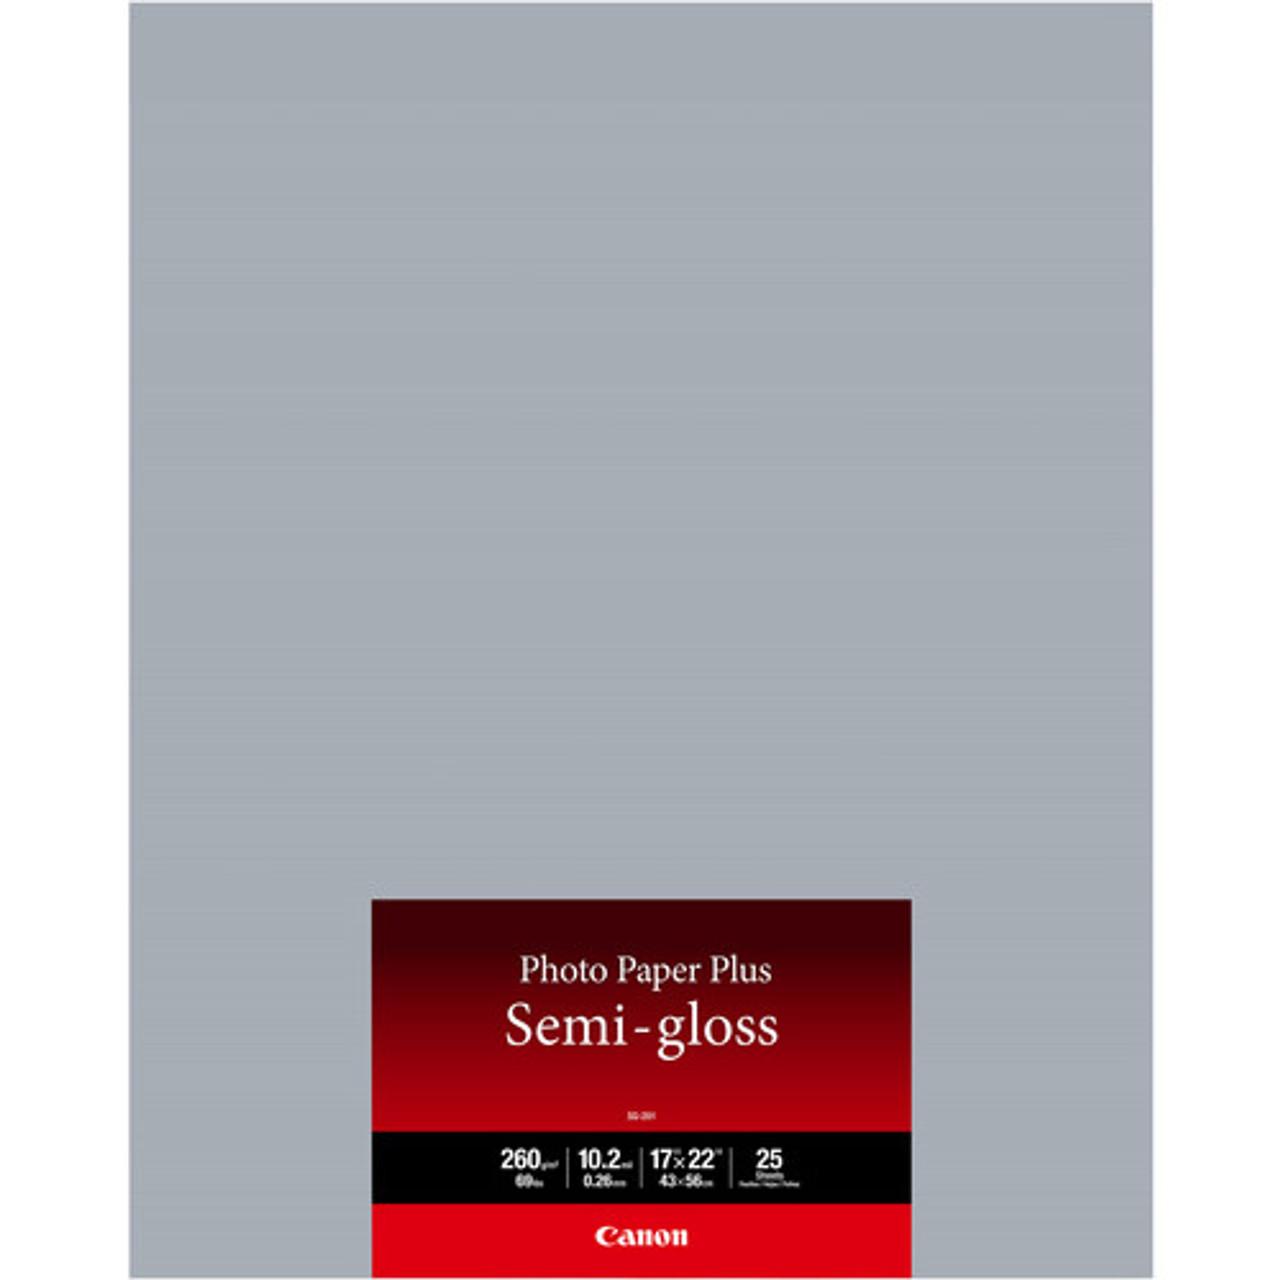 CANON PHOTO PAPER PLUS SEMI-GLOSS (17X22 - 25 SHEETS)